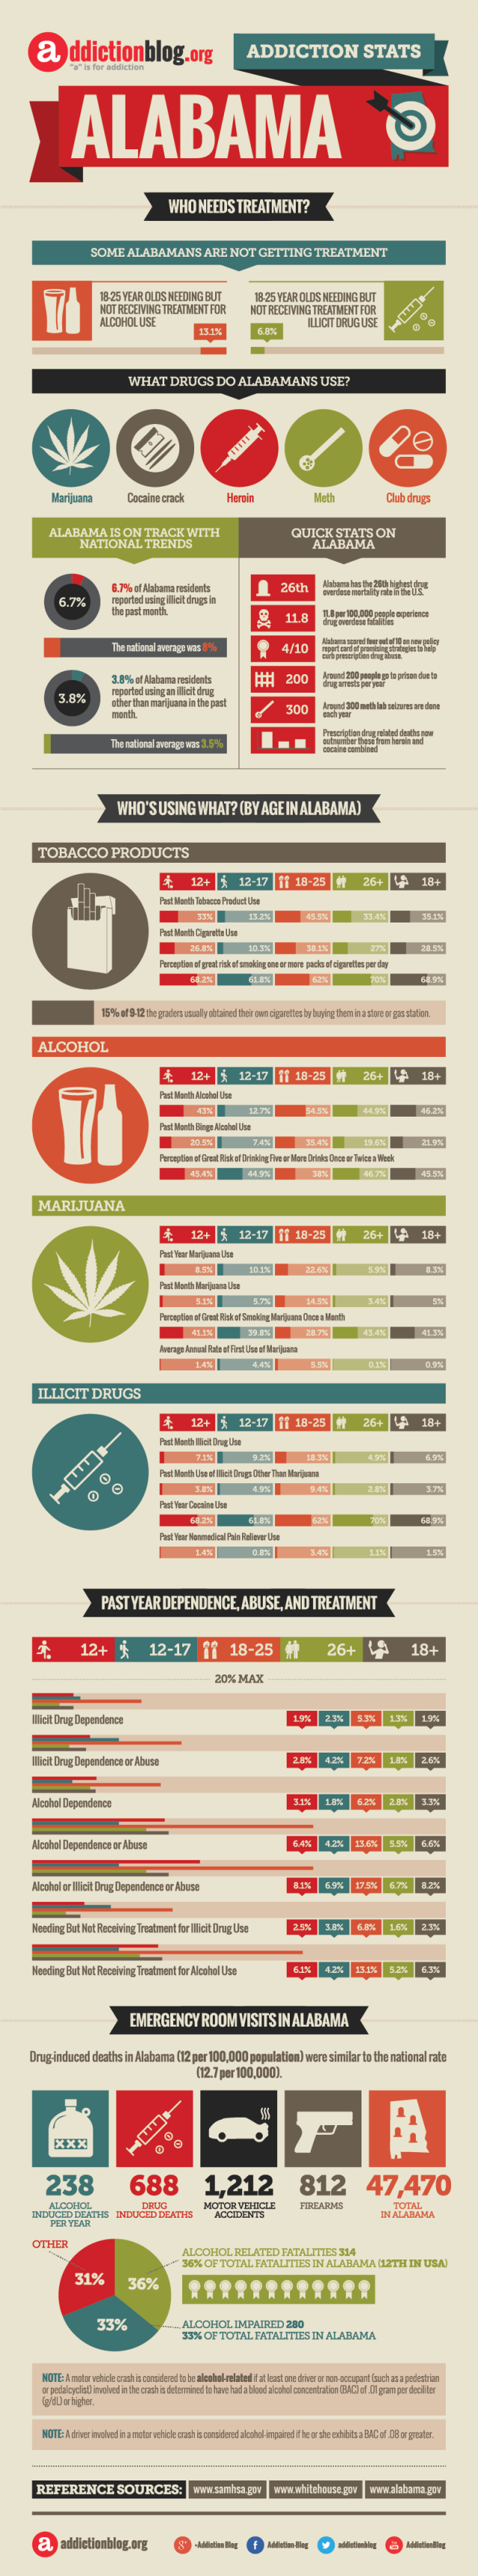 Alabama vital statistics: Who needs addiction treatment? (INFOGRAPHIC)